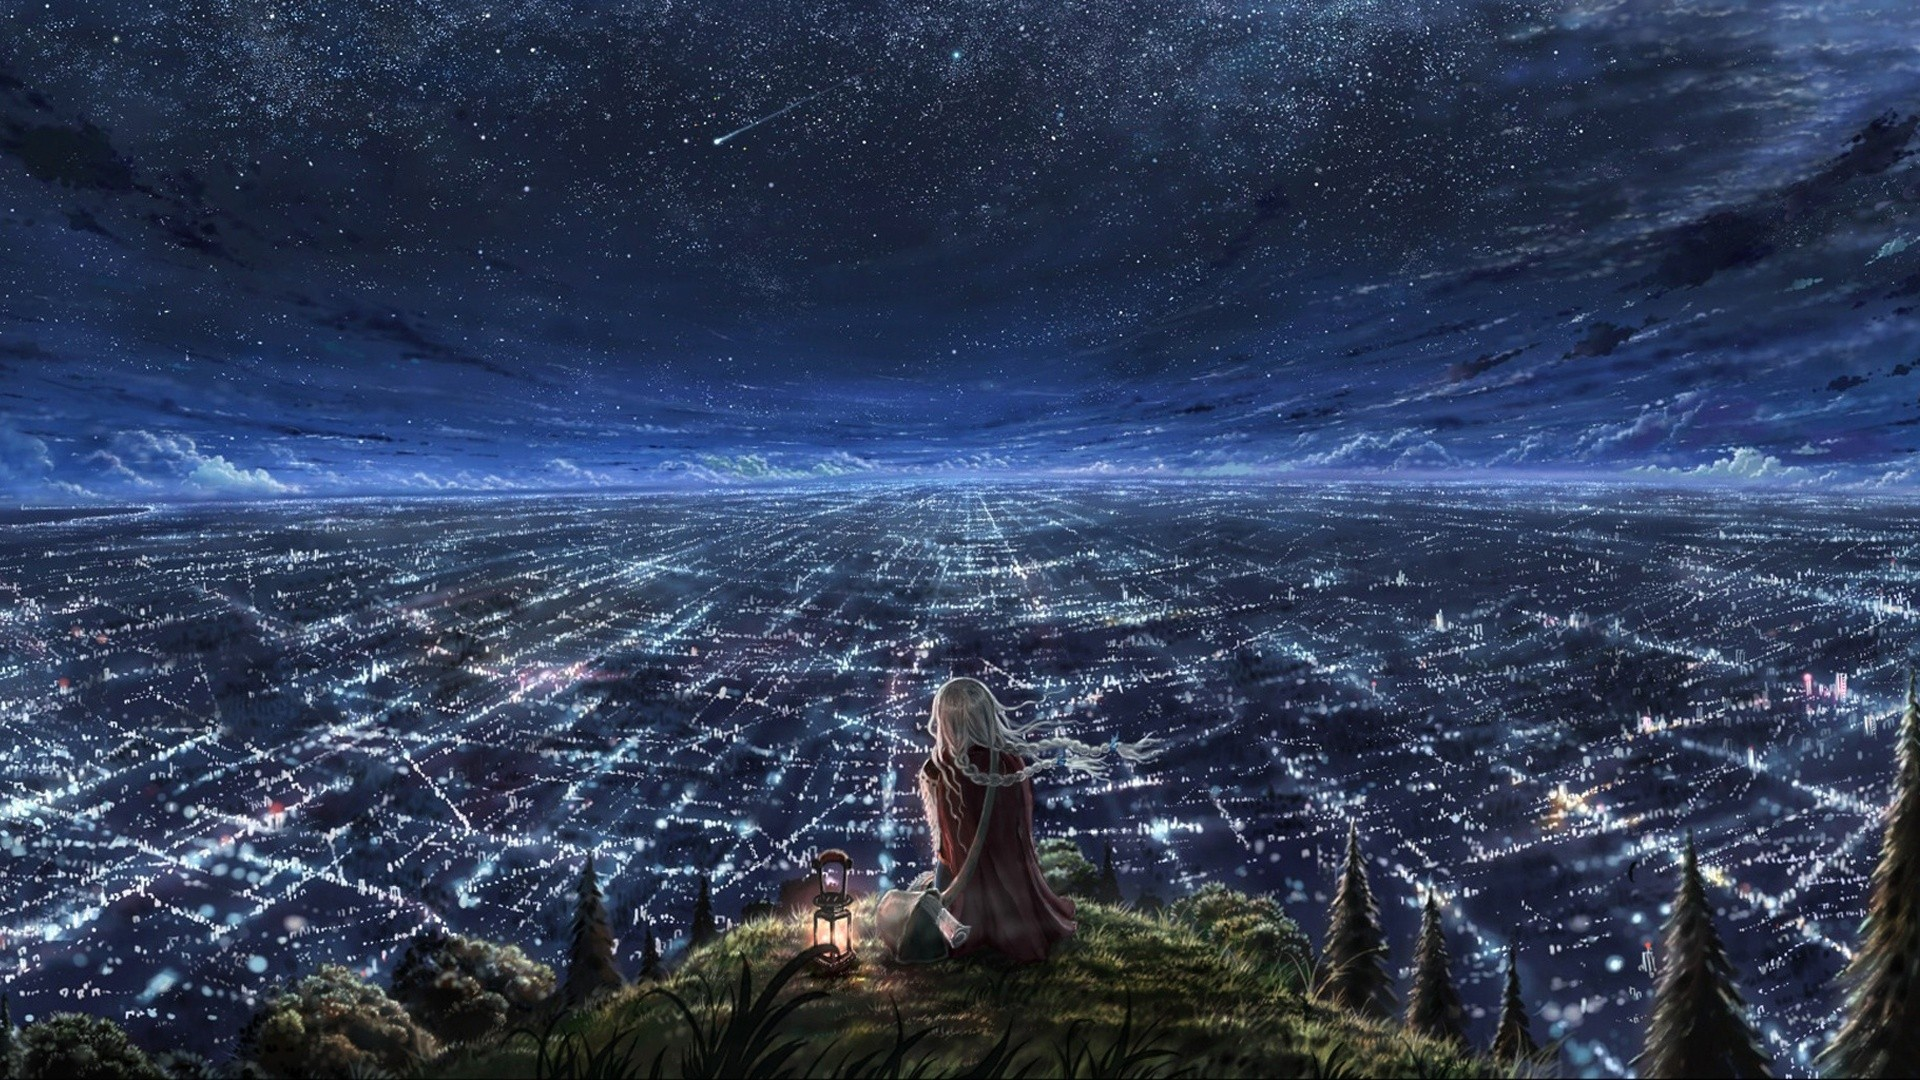 Anime 1920x1080 women starry night animation cityscape city drawing fantasy art anime girls sky lantern stars artwork fantasy girl